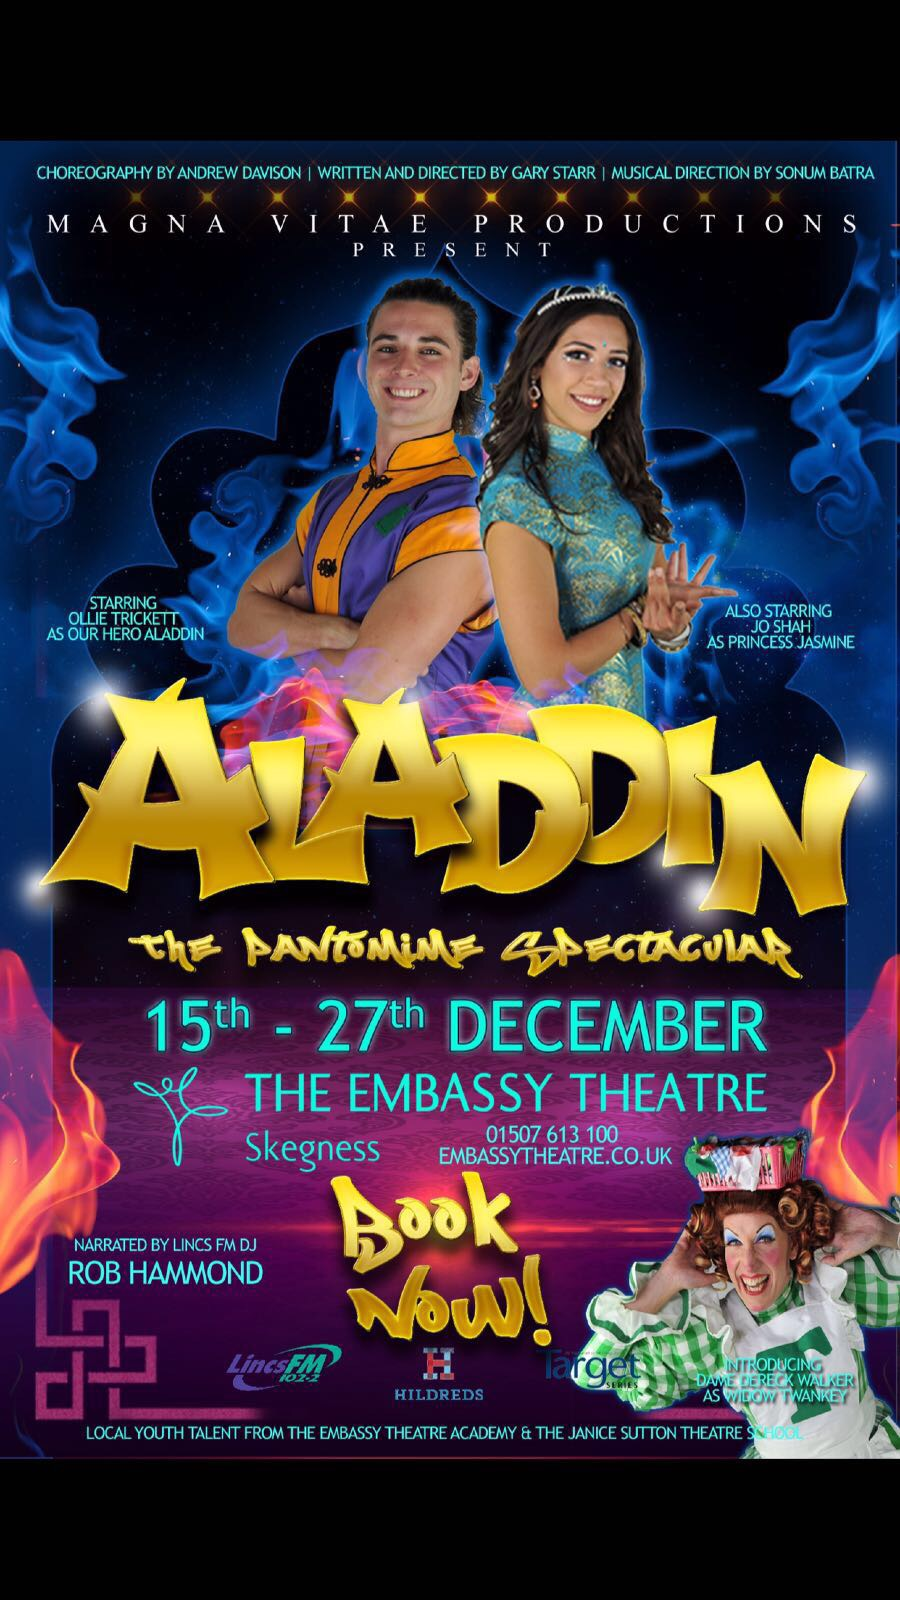 Aladdin-JoShah.JPG